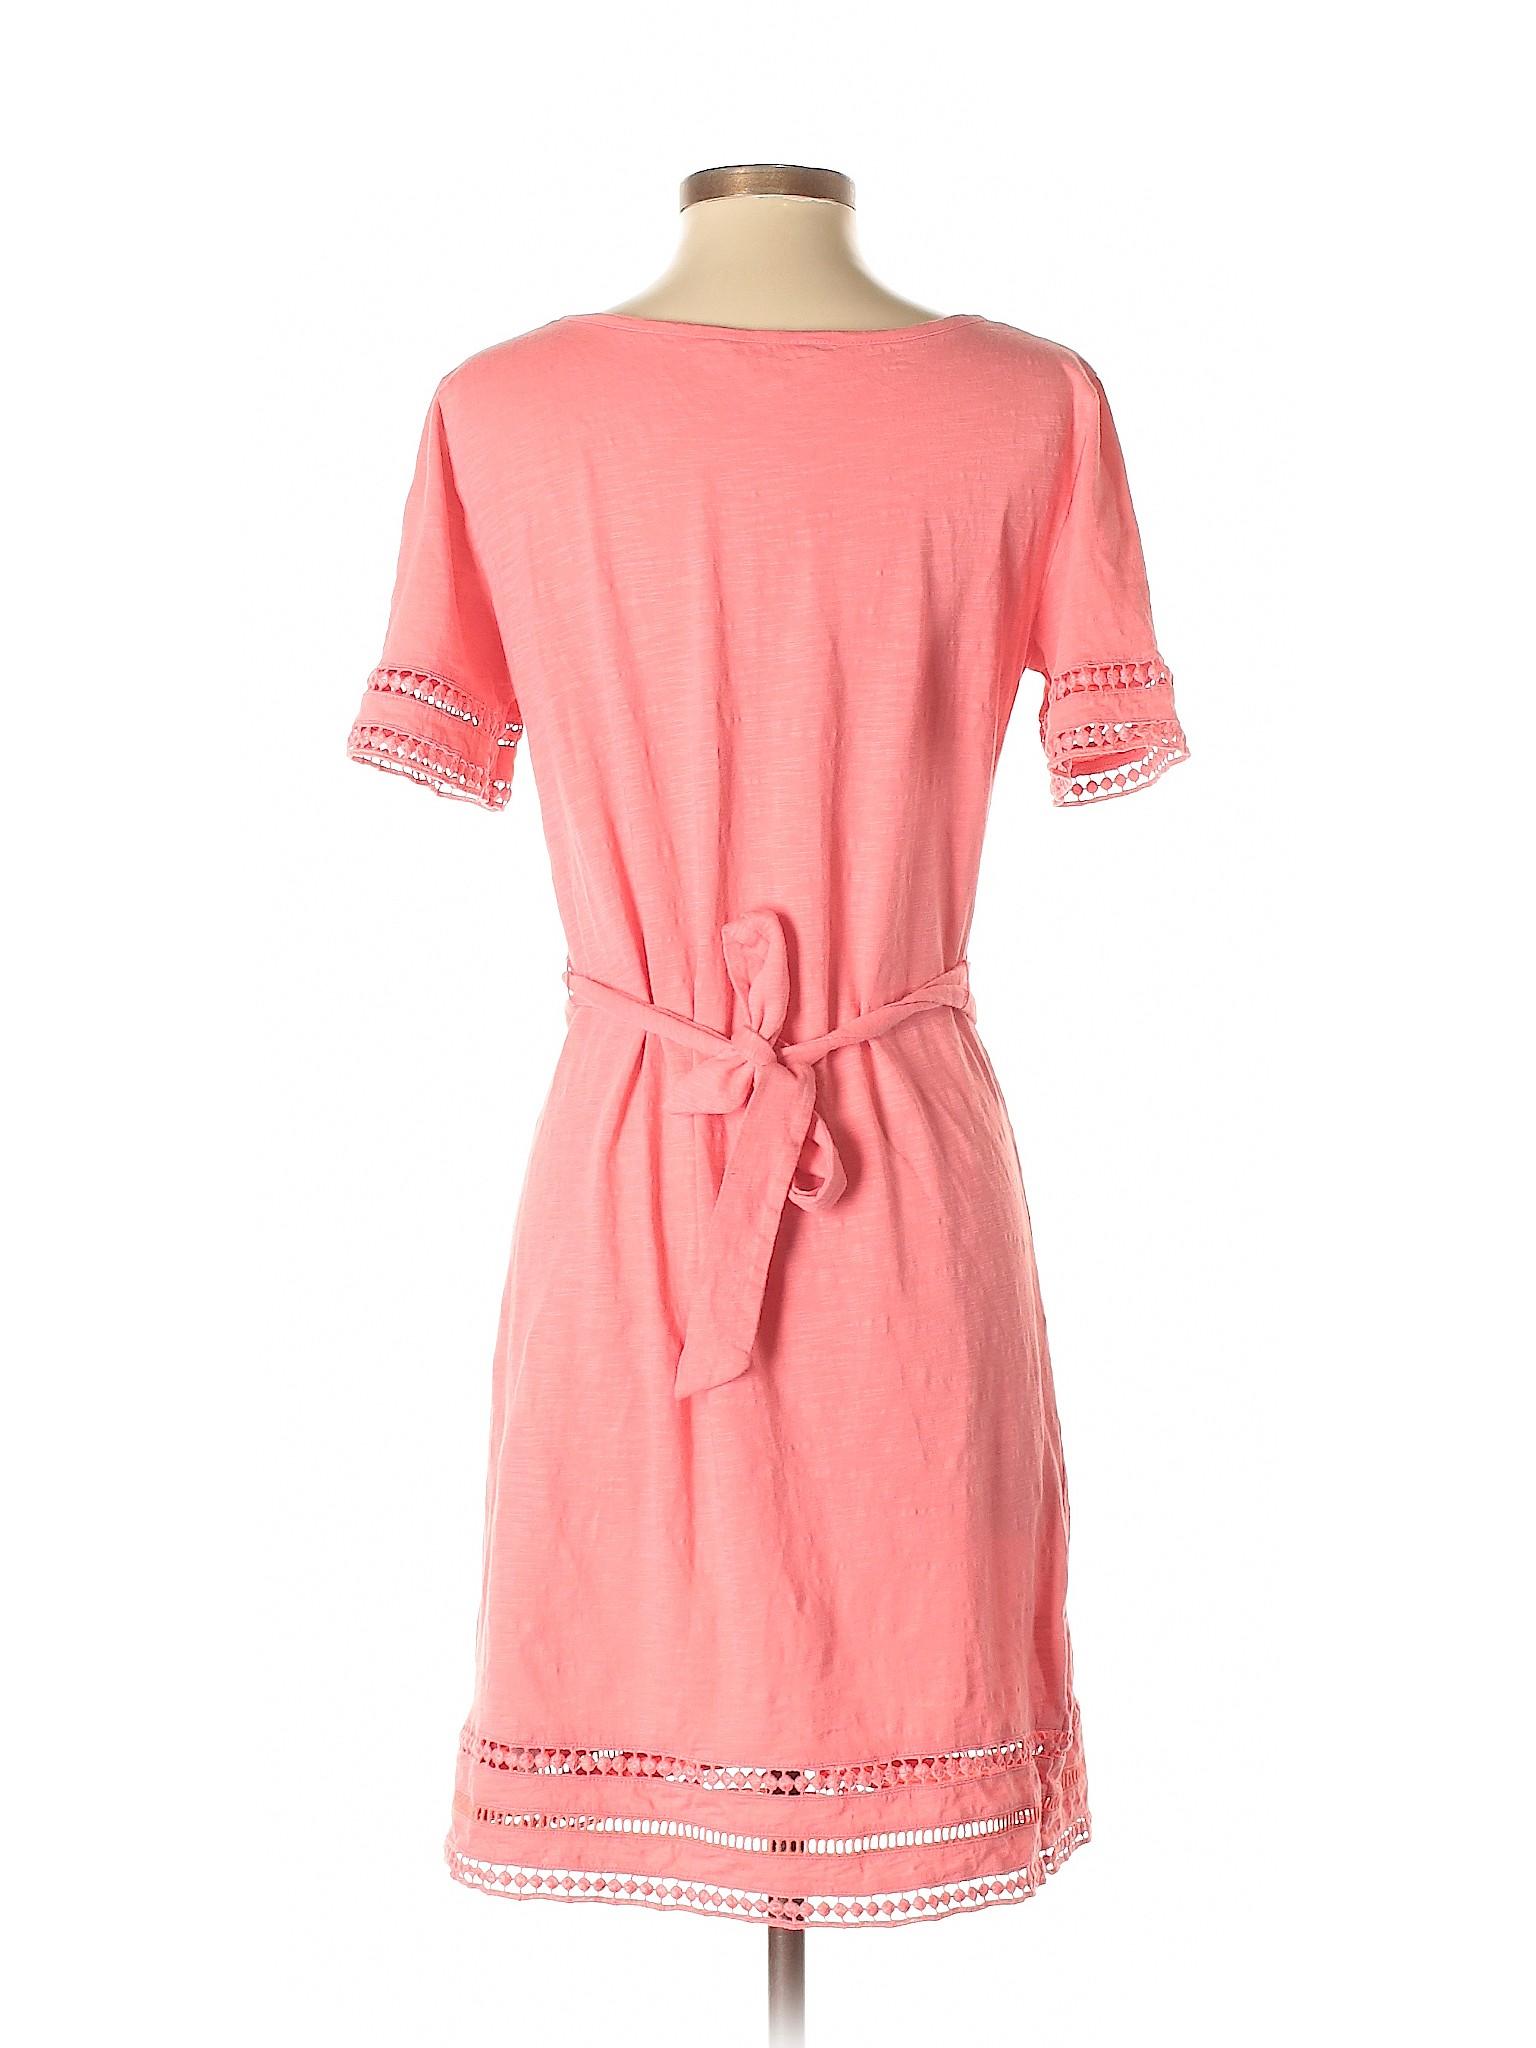 Hilfiger Boutique Casual winter Dress Tommy EwwqHgv6